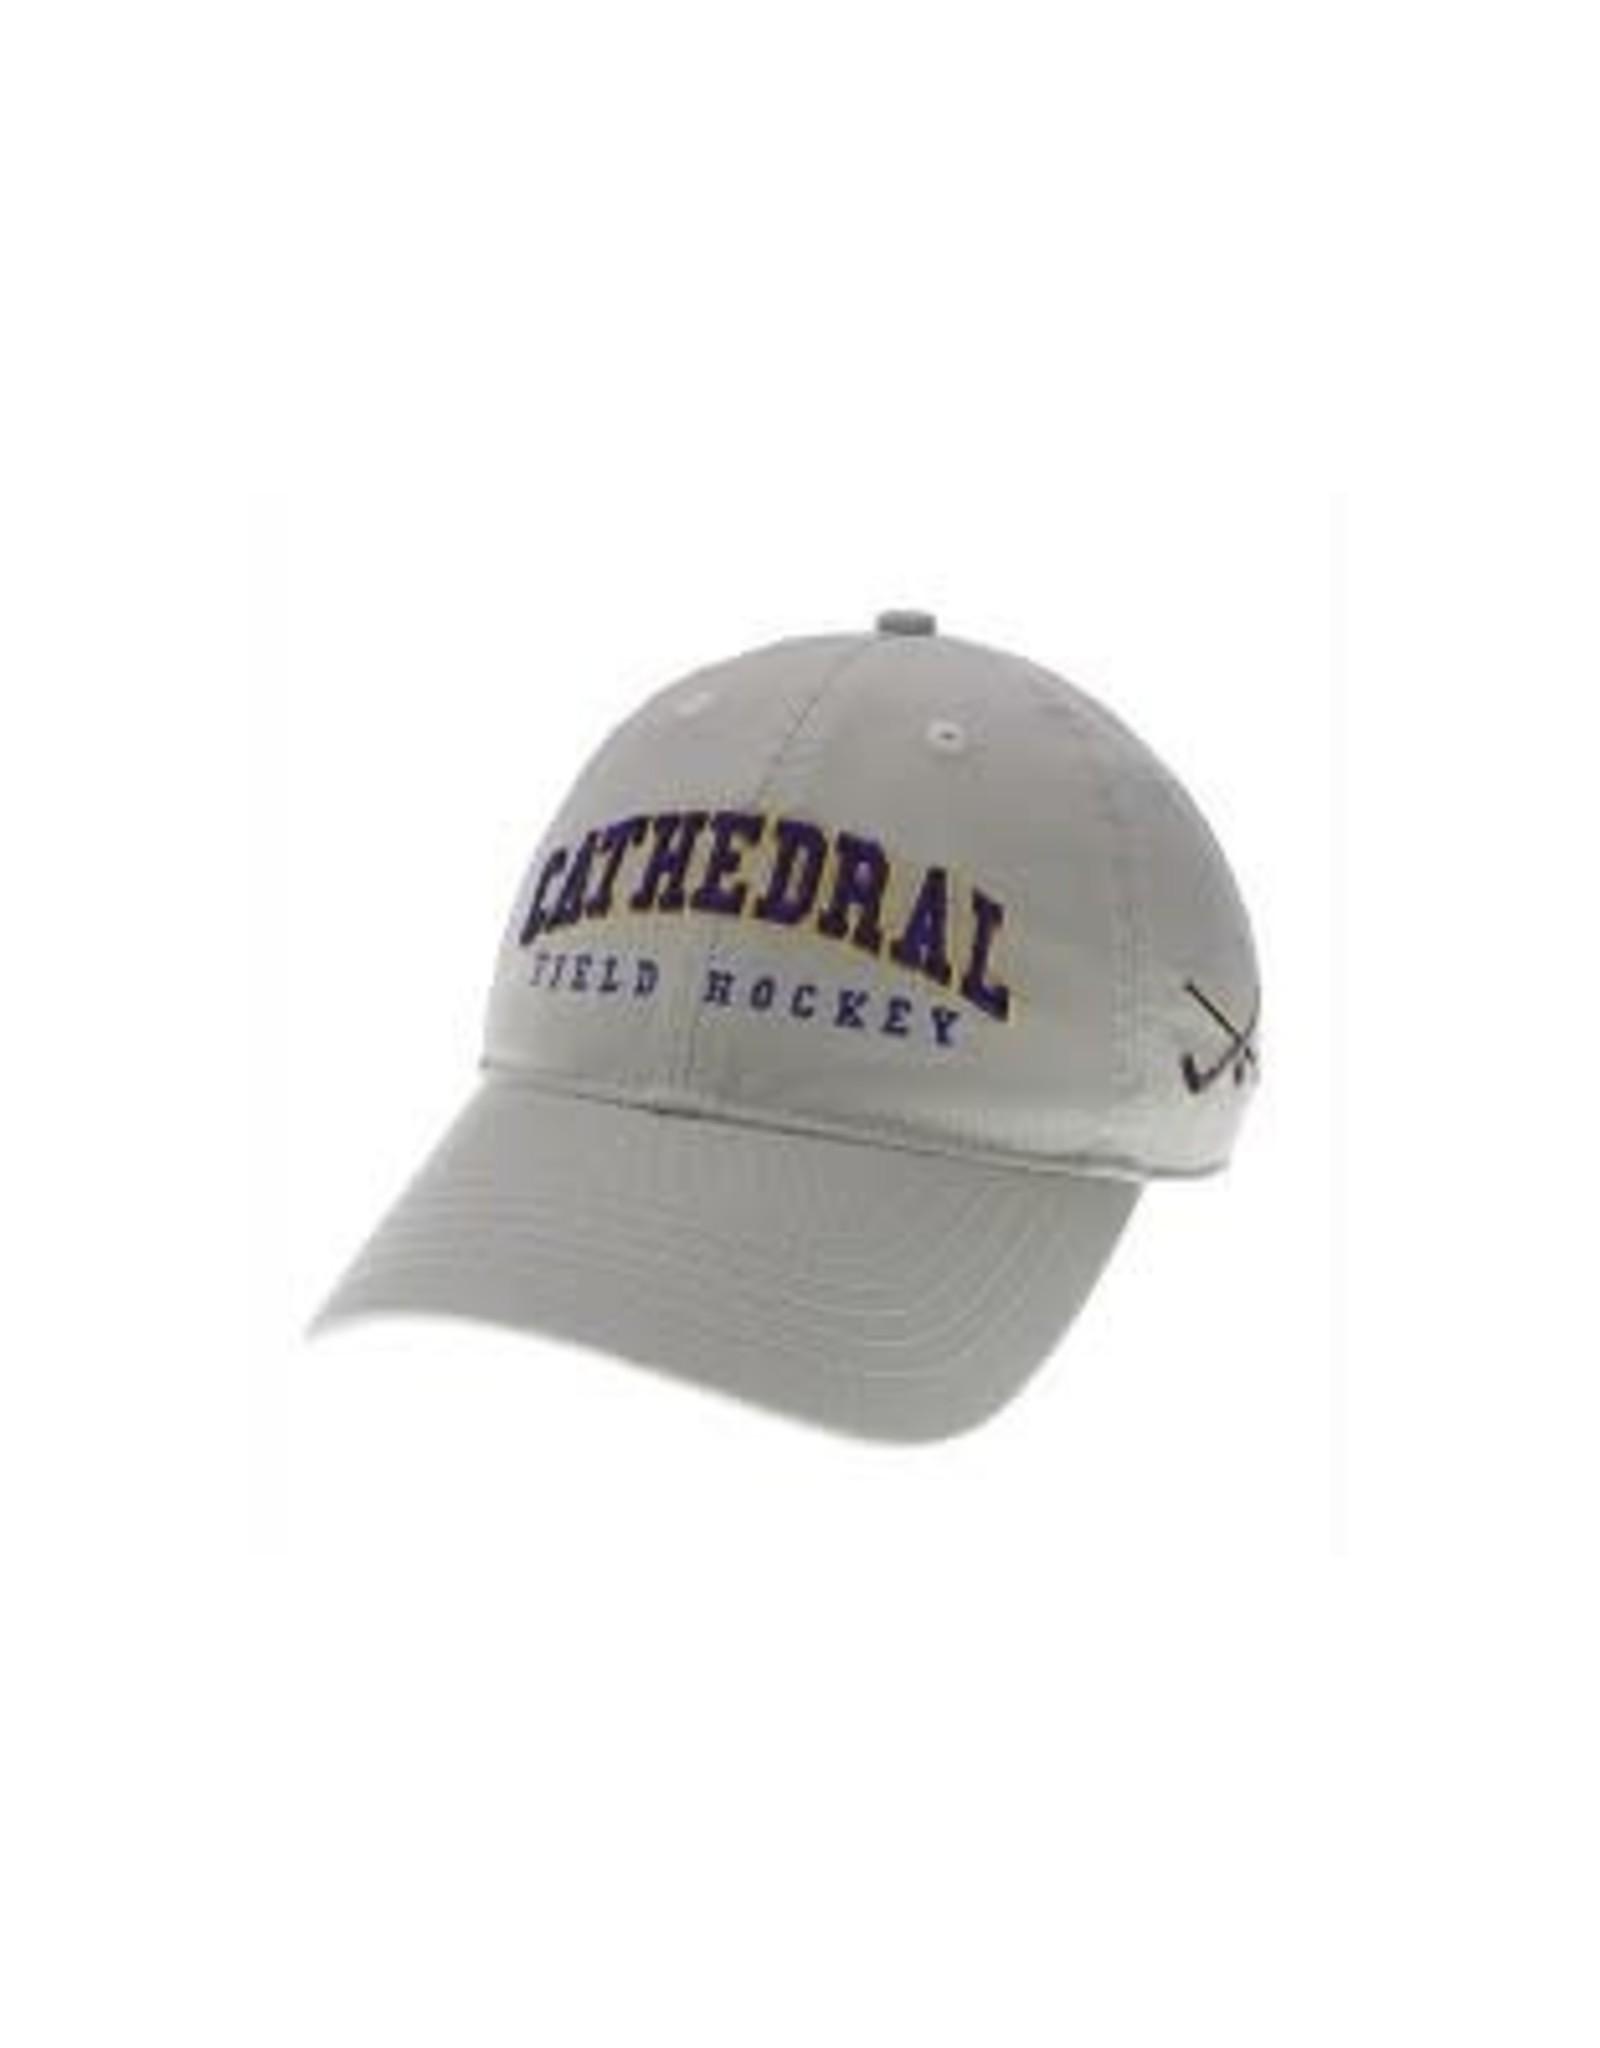 HAT-LEGACY-TAN FIELD HOCKEY